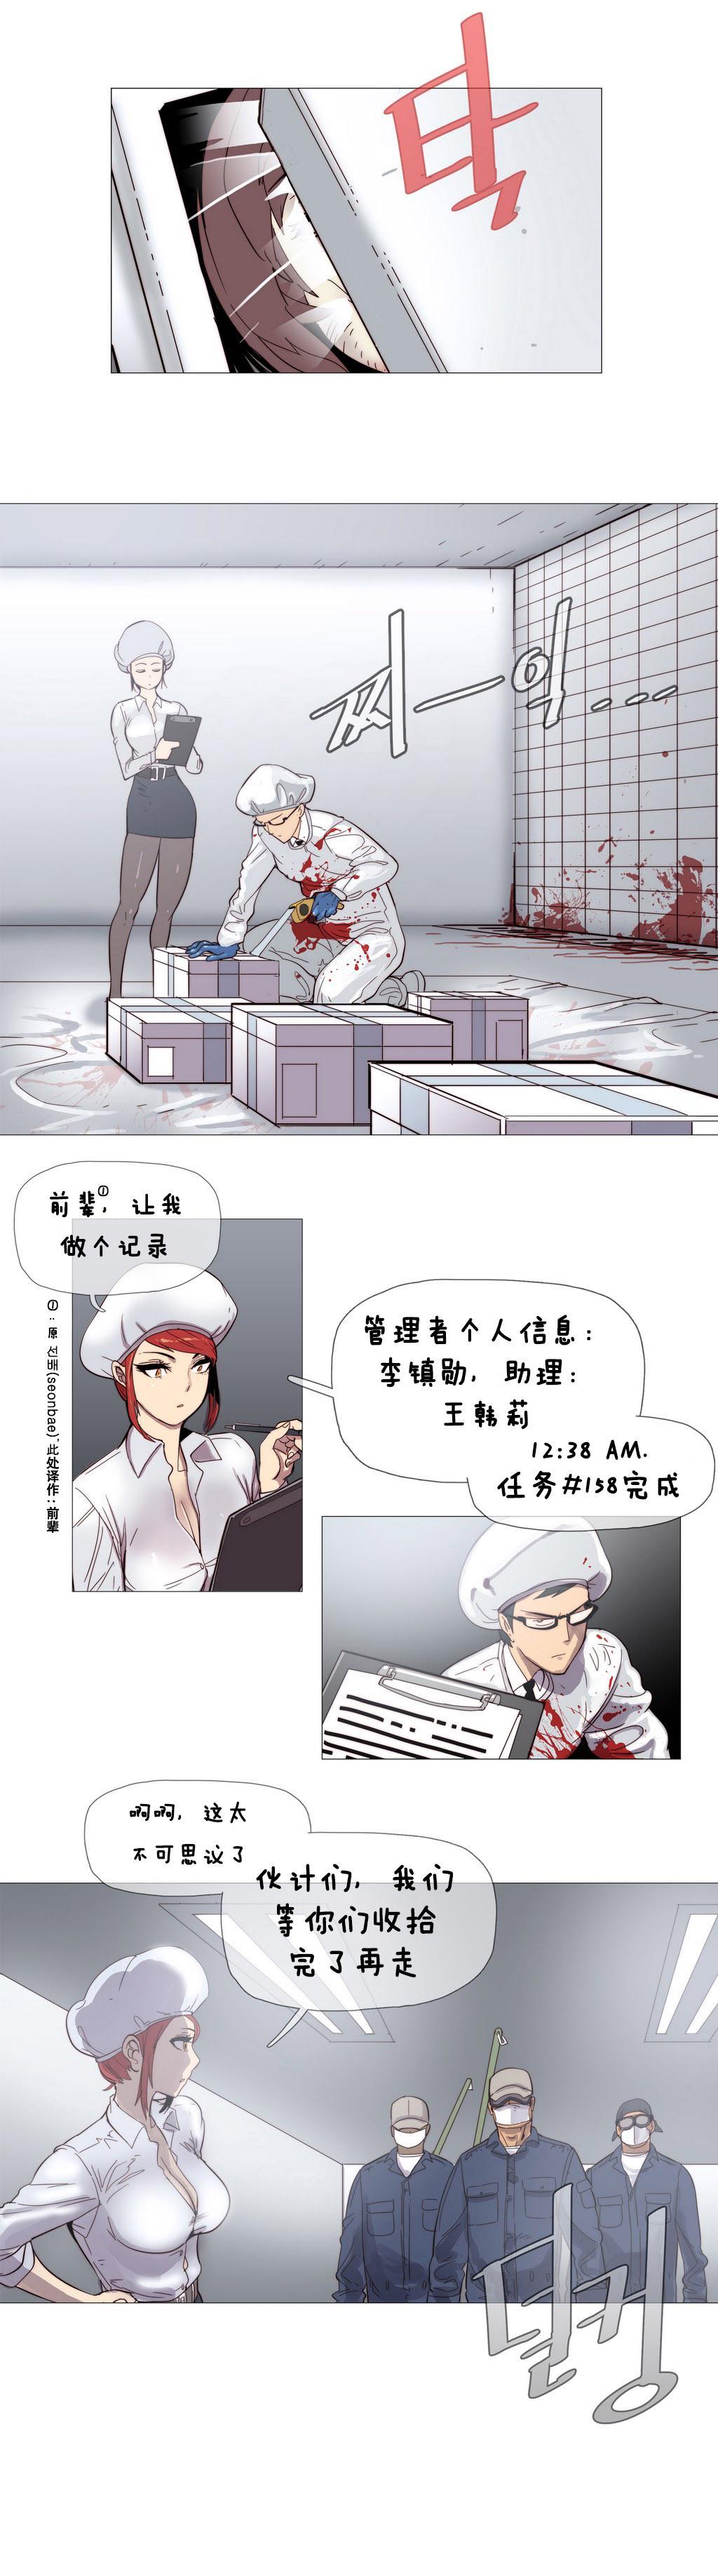 HouseHold Affairs 【卞赤鲤个人汉化】1~21话(持续更新中) 43